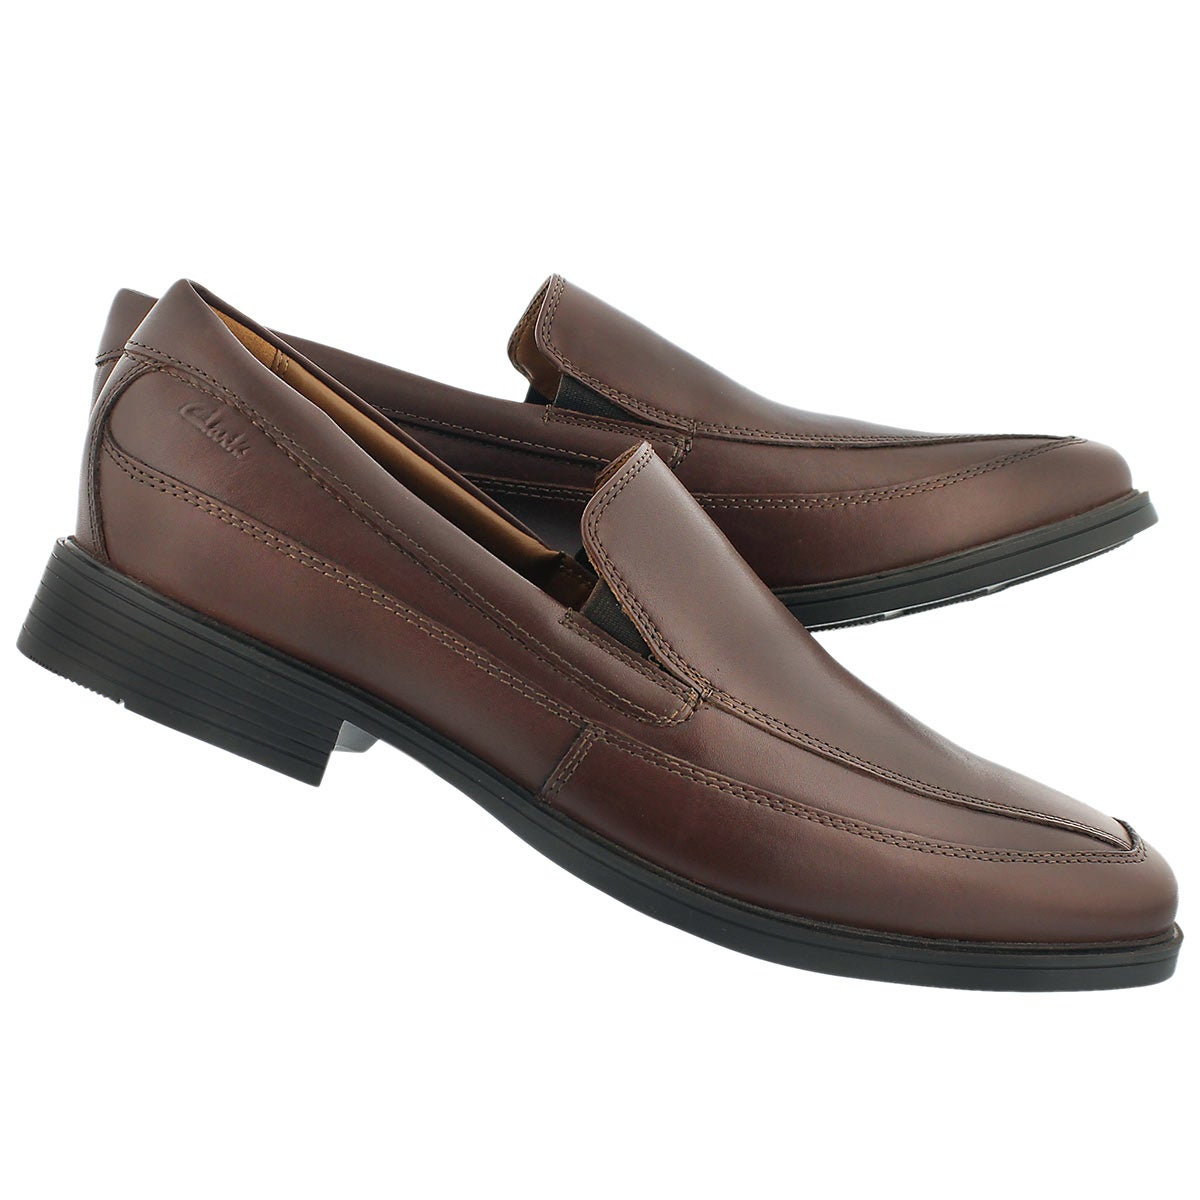 Flâneur habillé Tilden Free, brun, homme